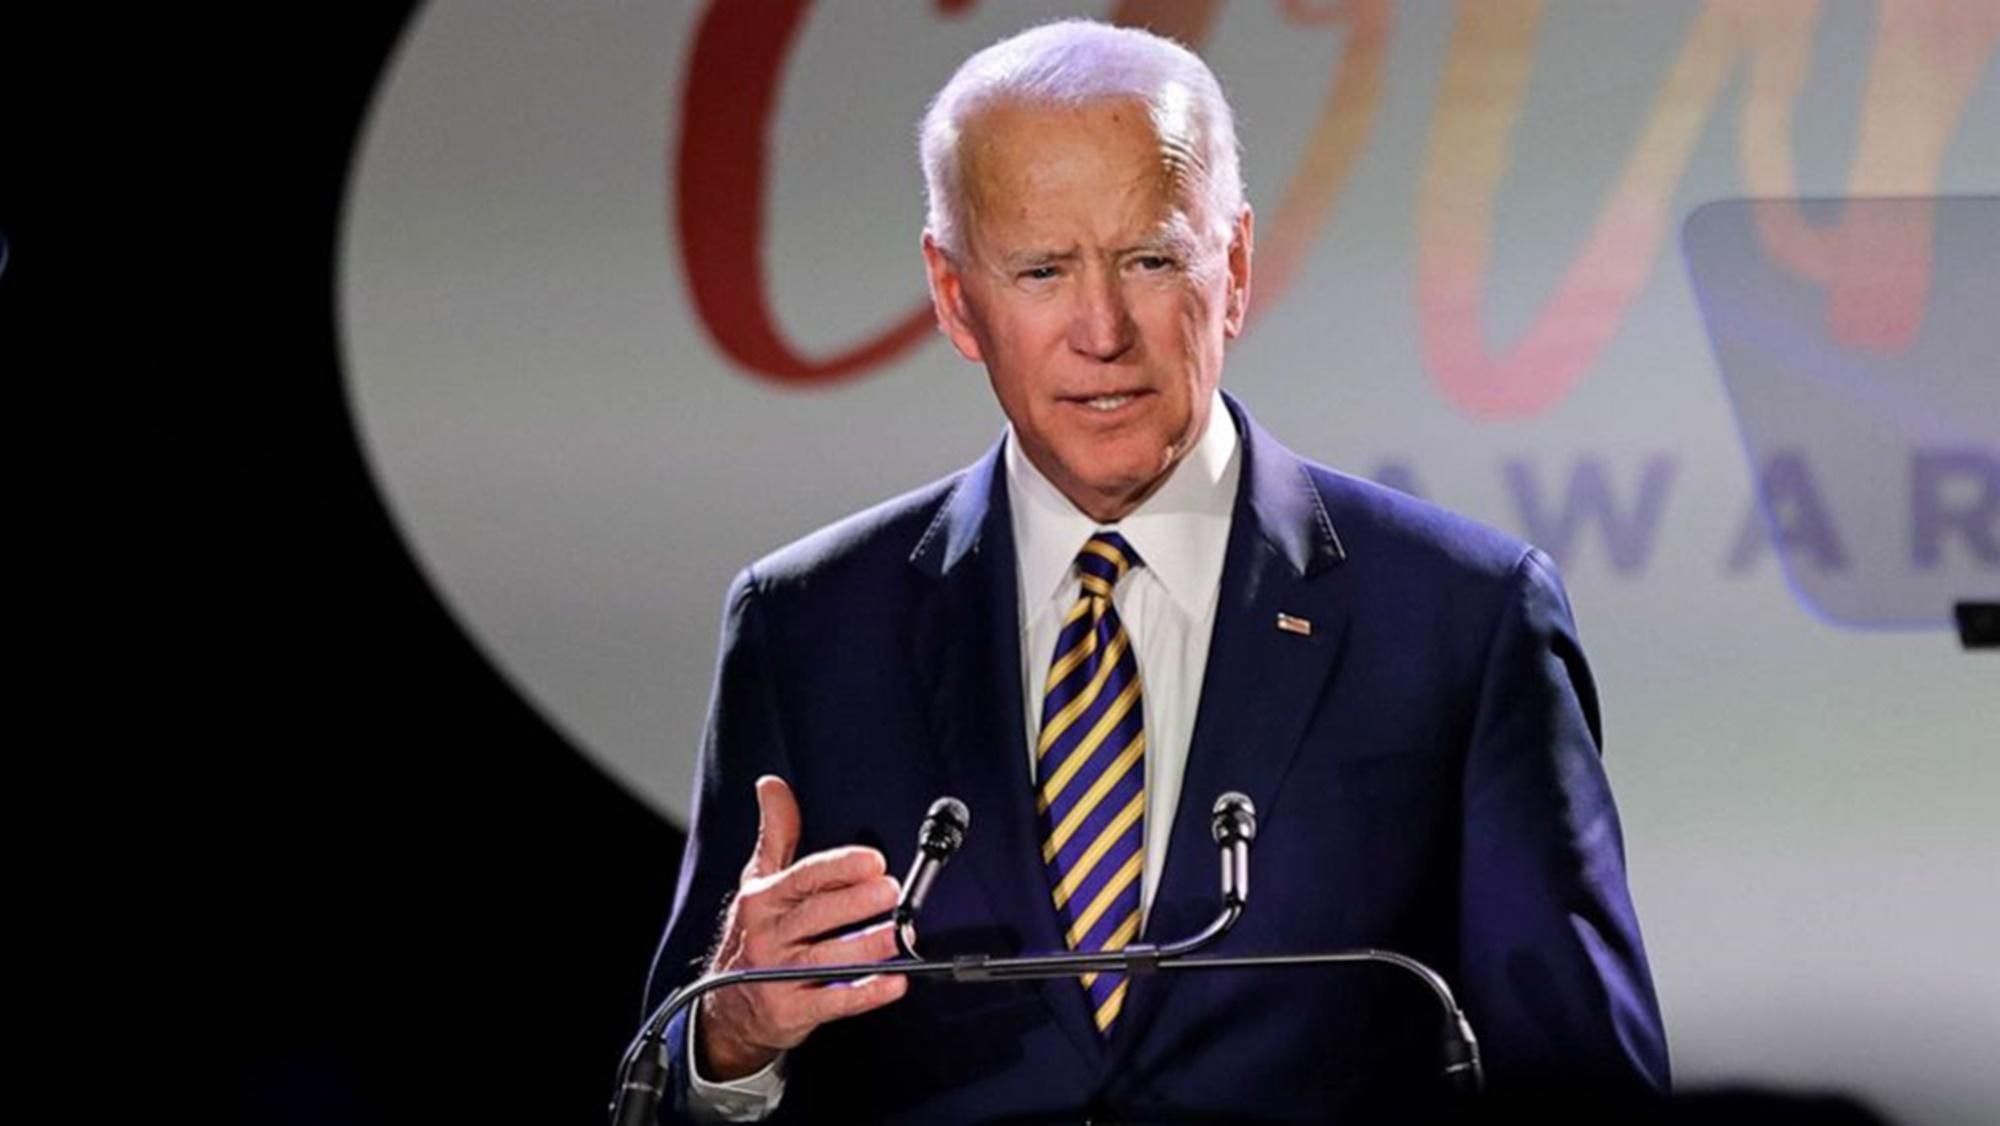 Joe Biden Anita Hill Hearing Apology